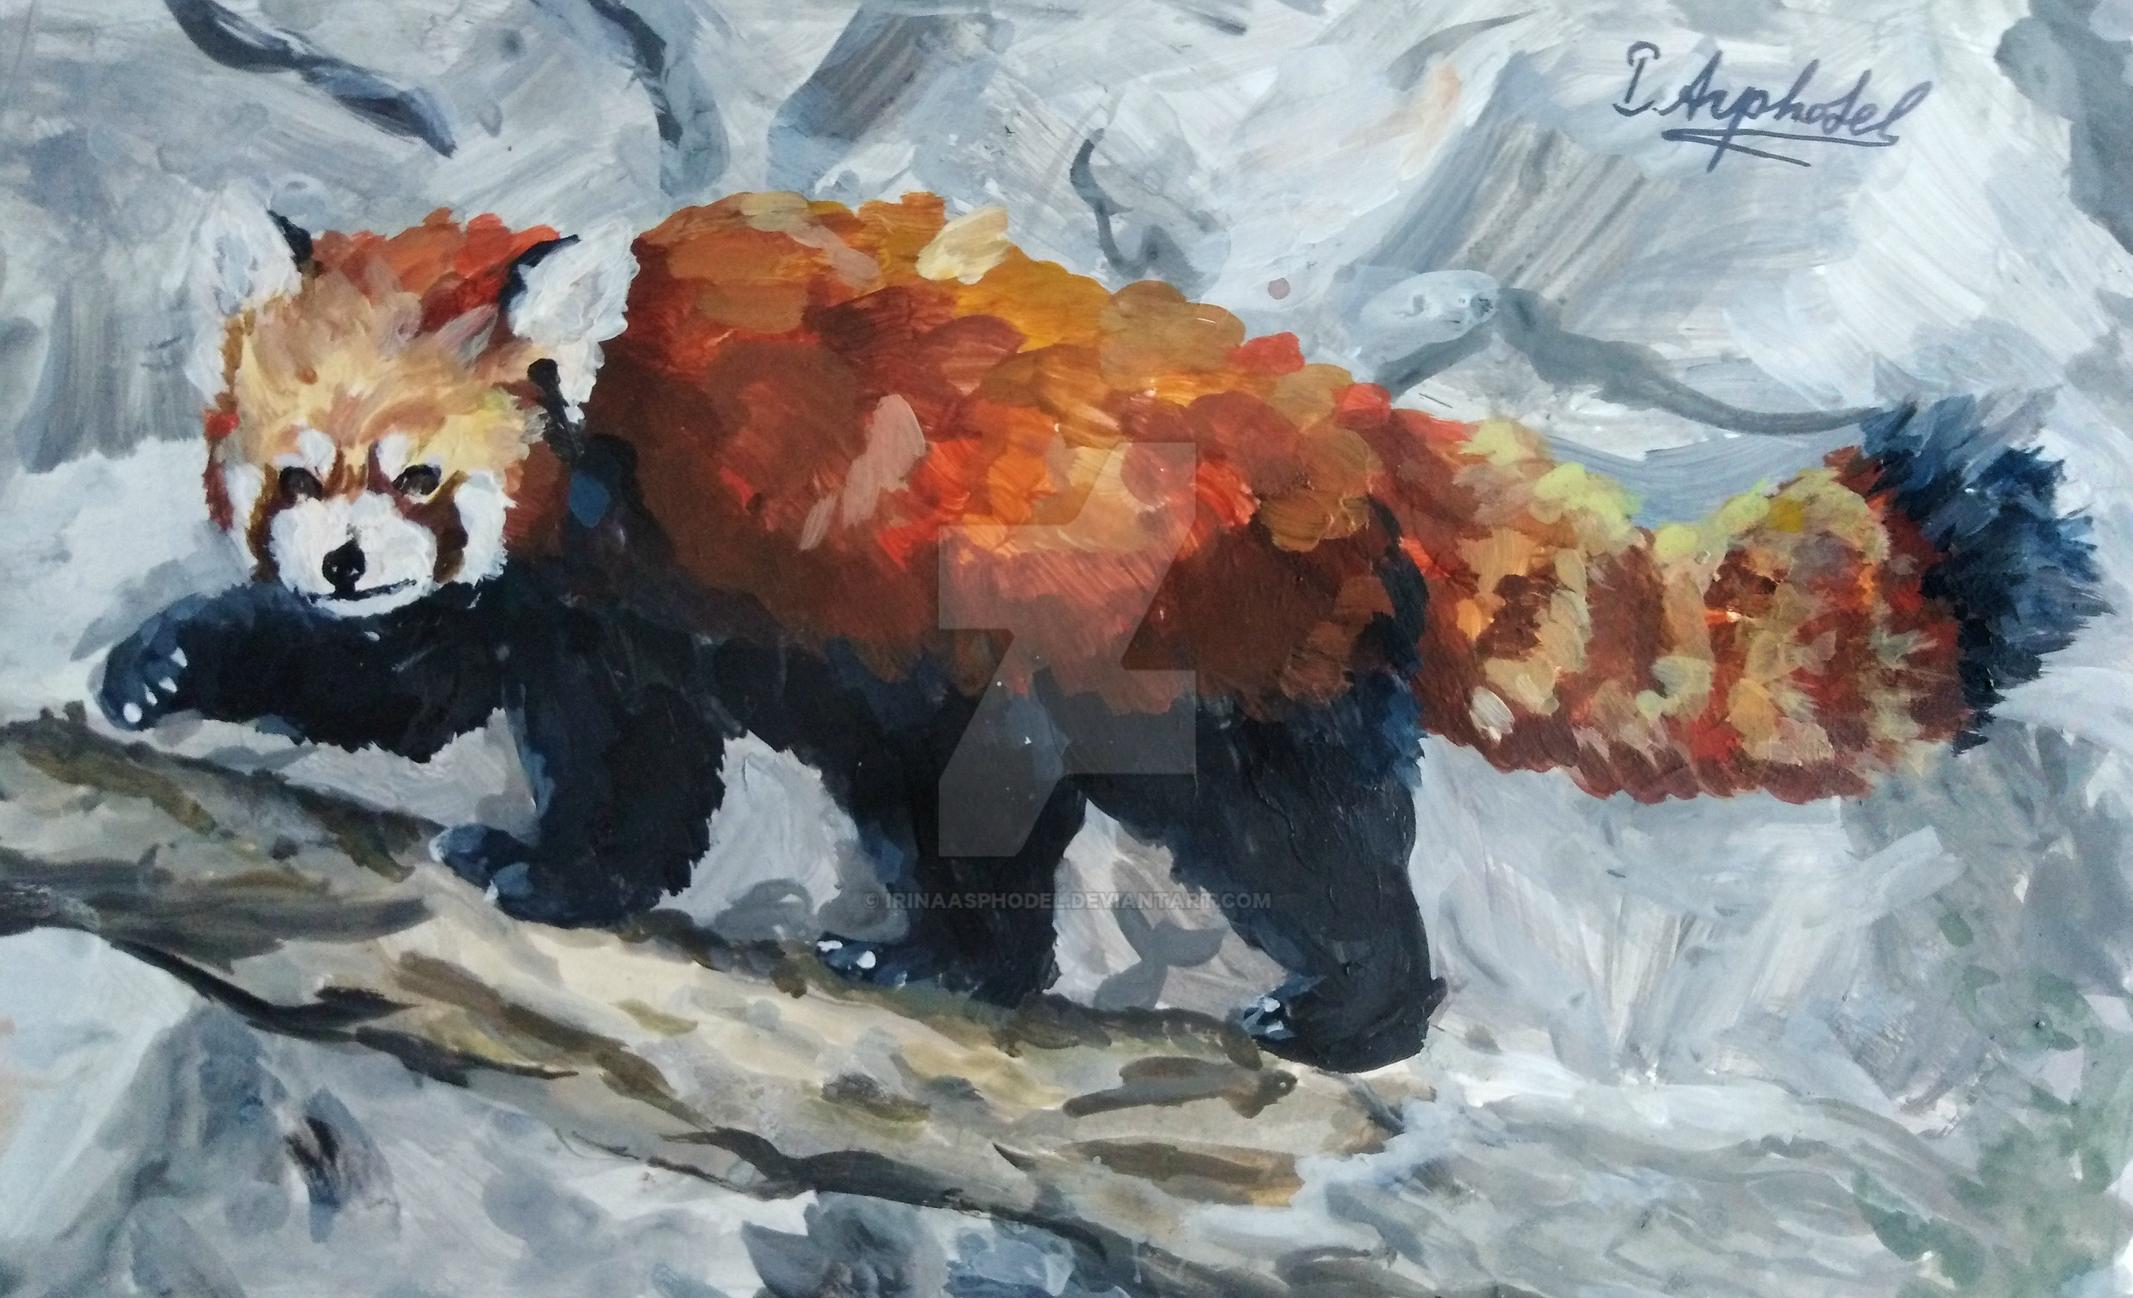 Red panda study by IrinaAsphodel